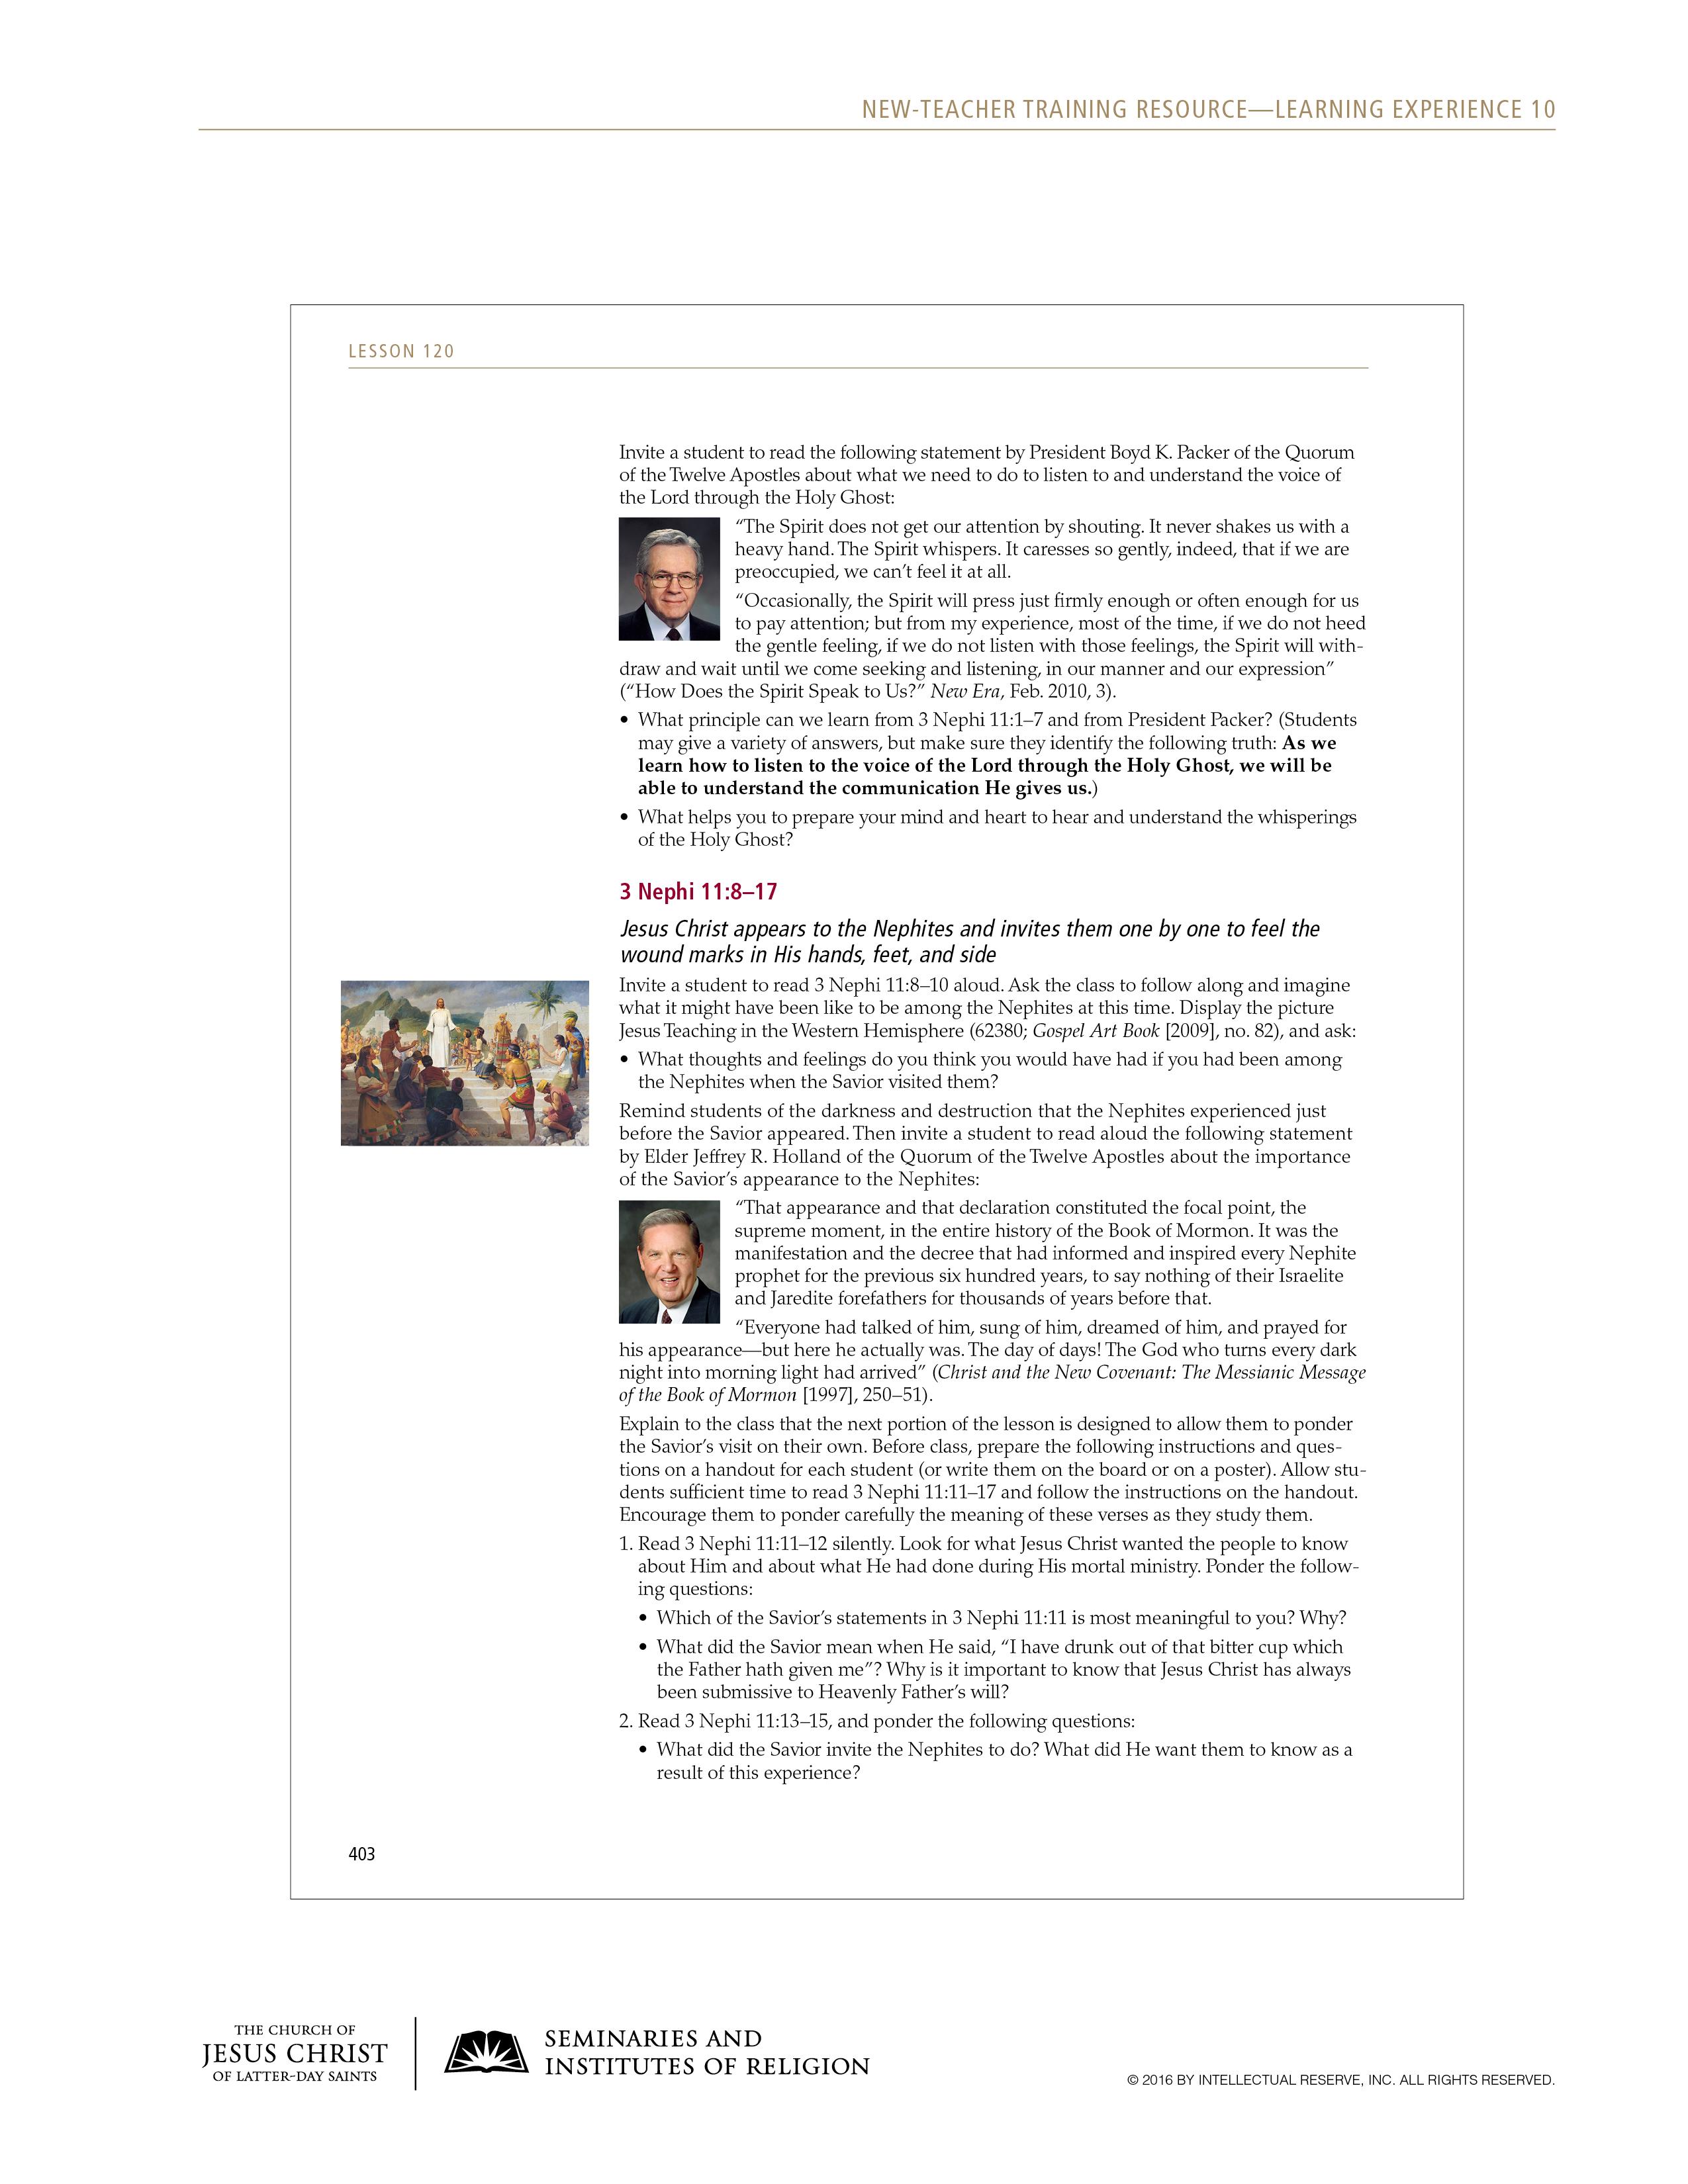 handout, Sample Lesson, page 2